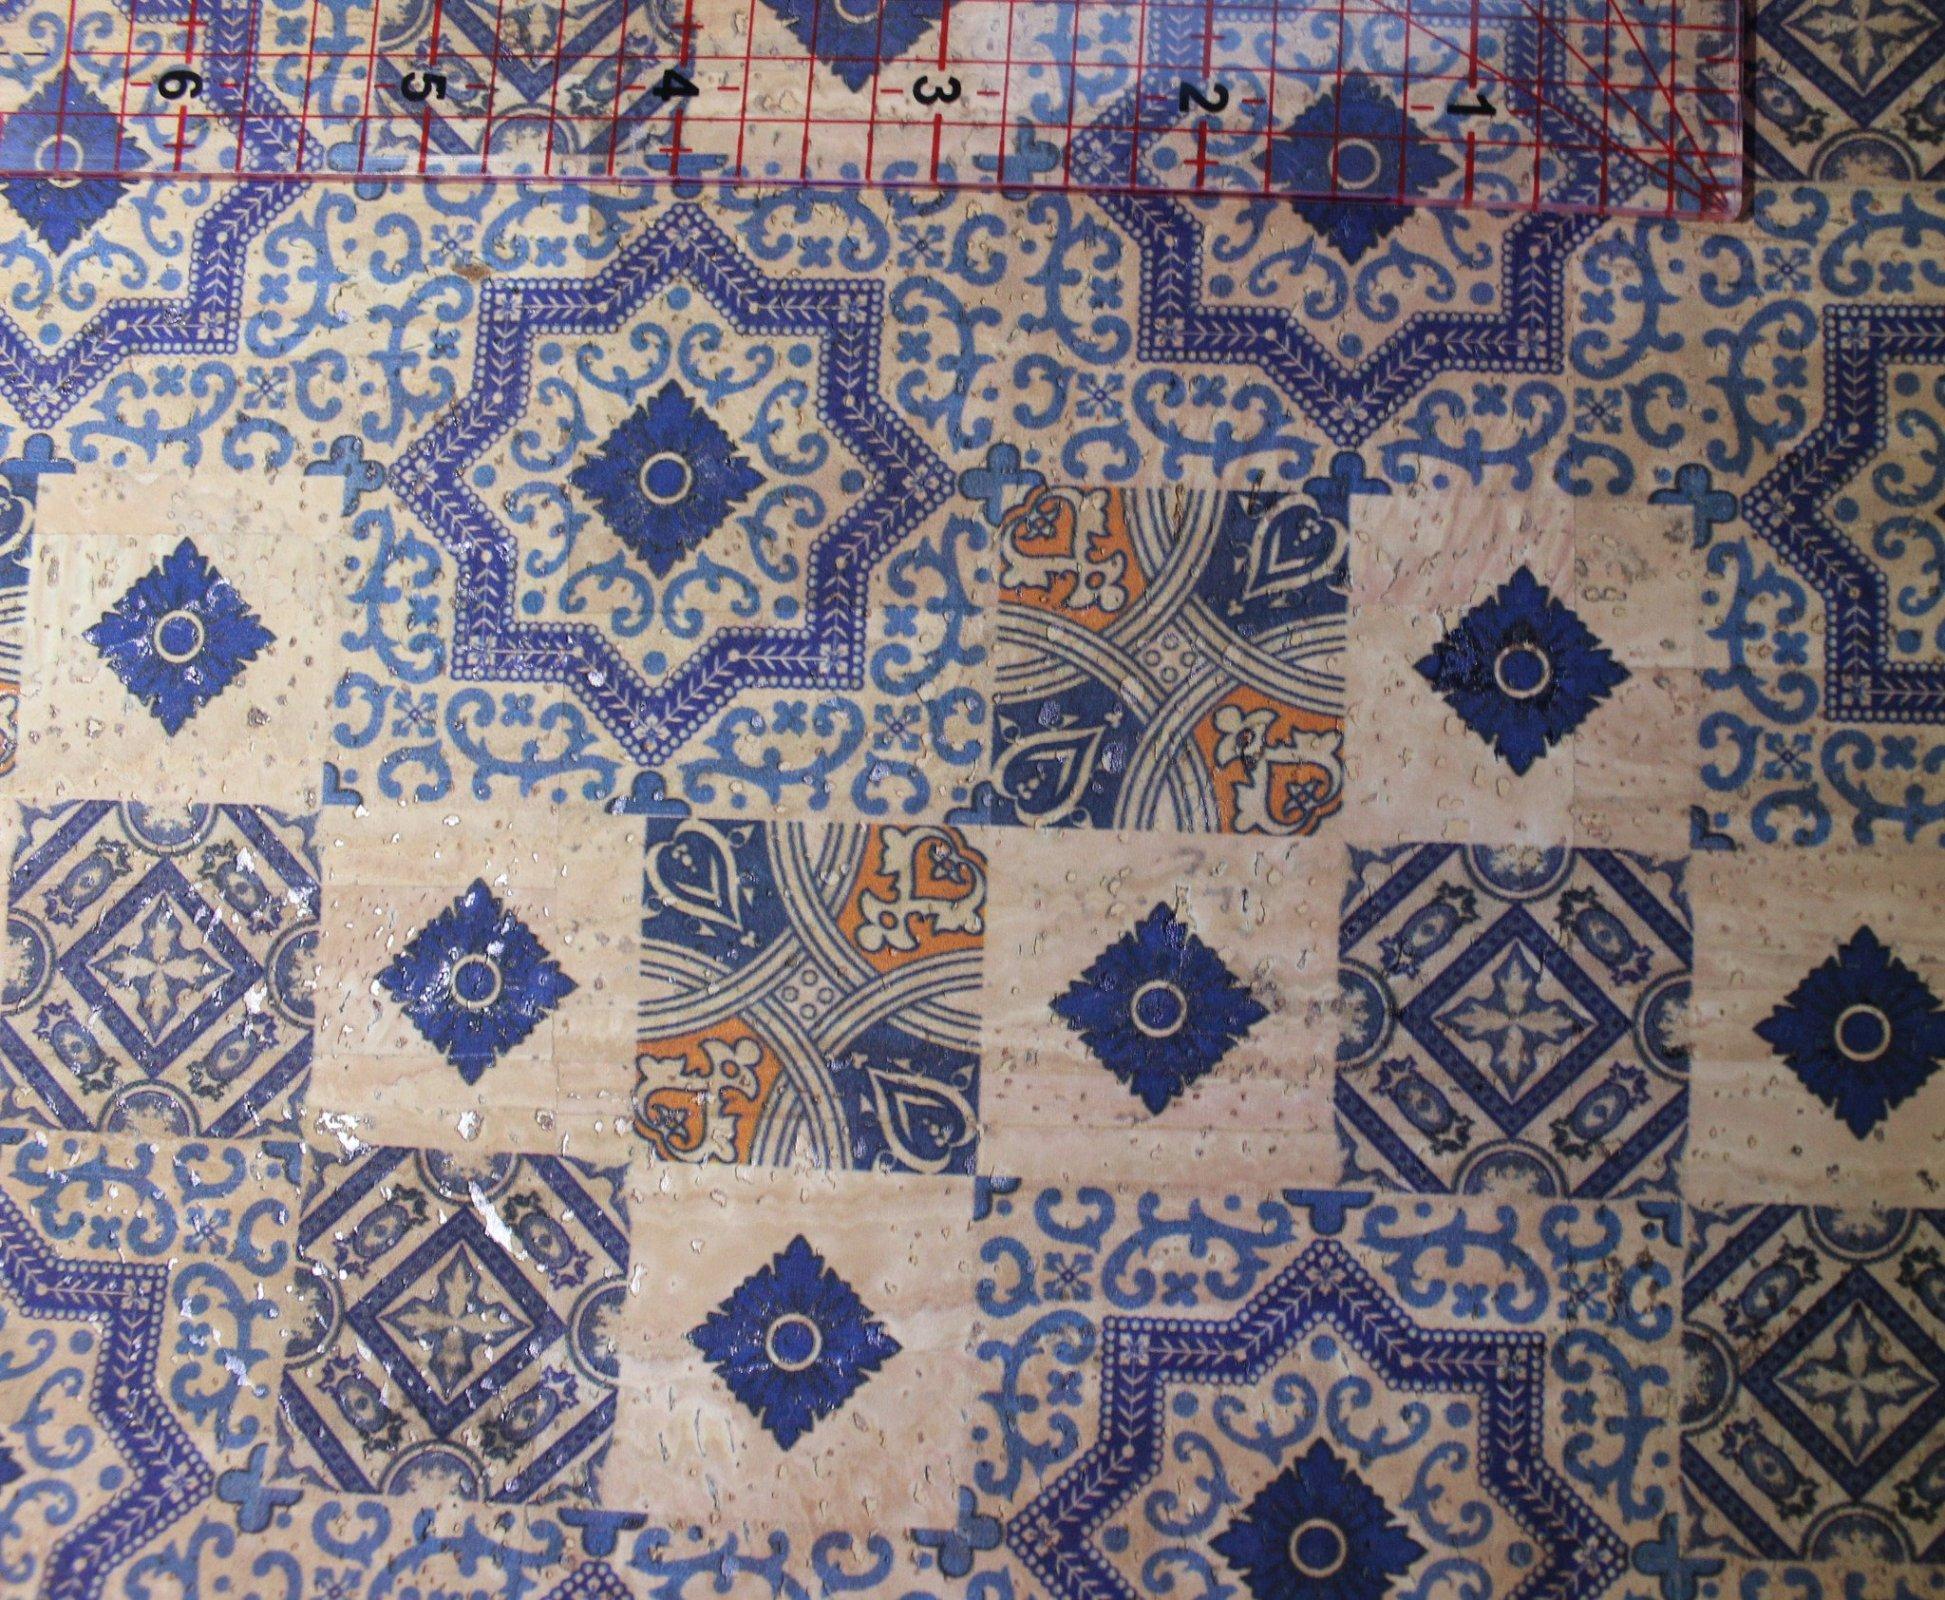 Printed Tiles Cork Fabric (18x36)